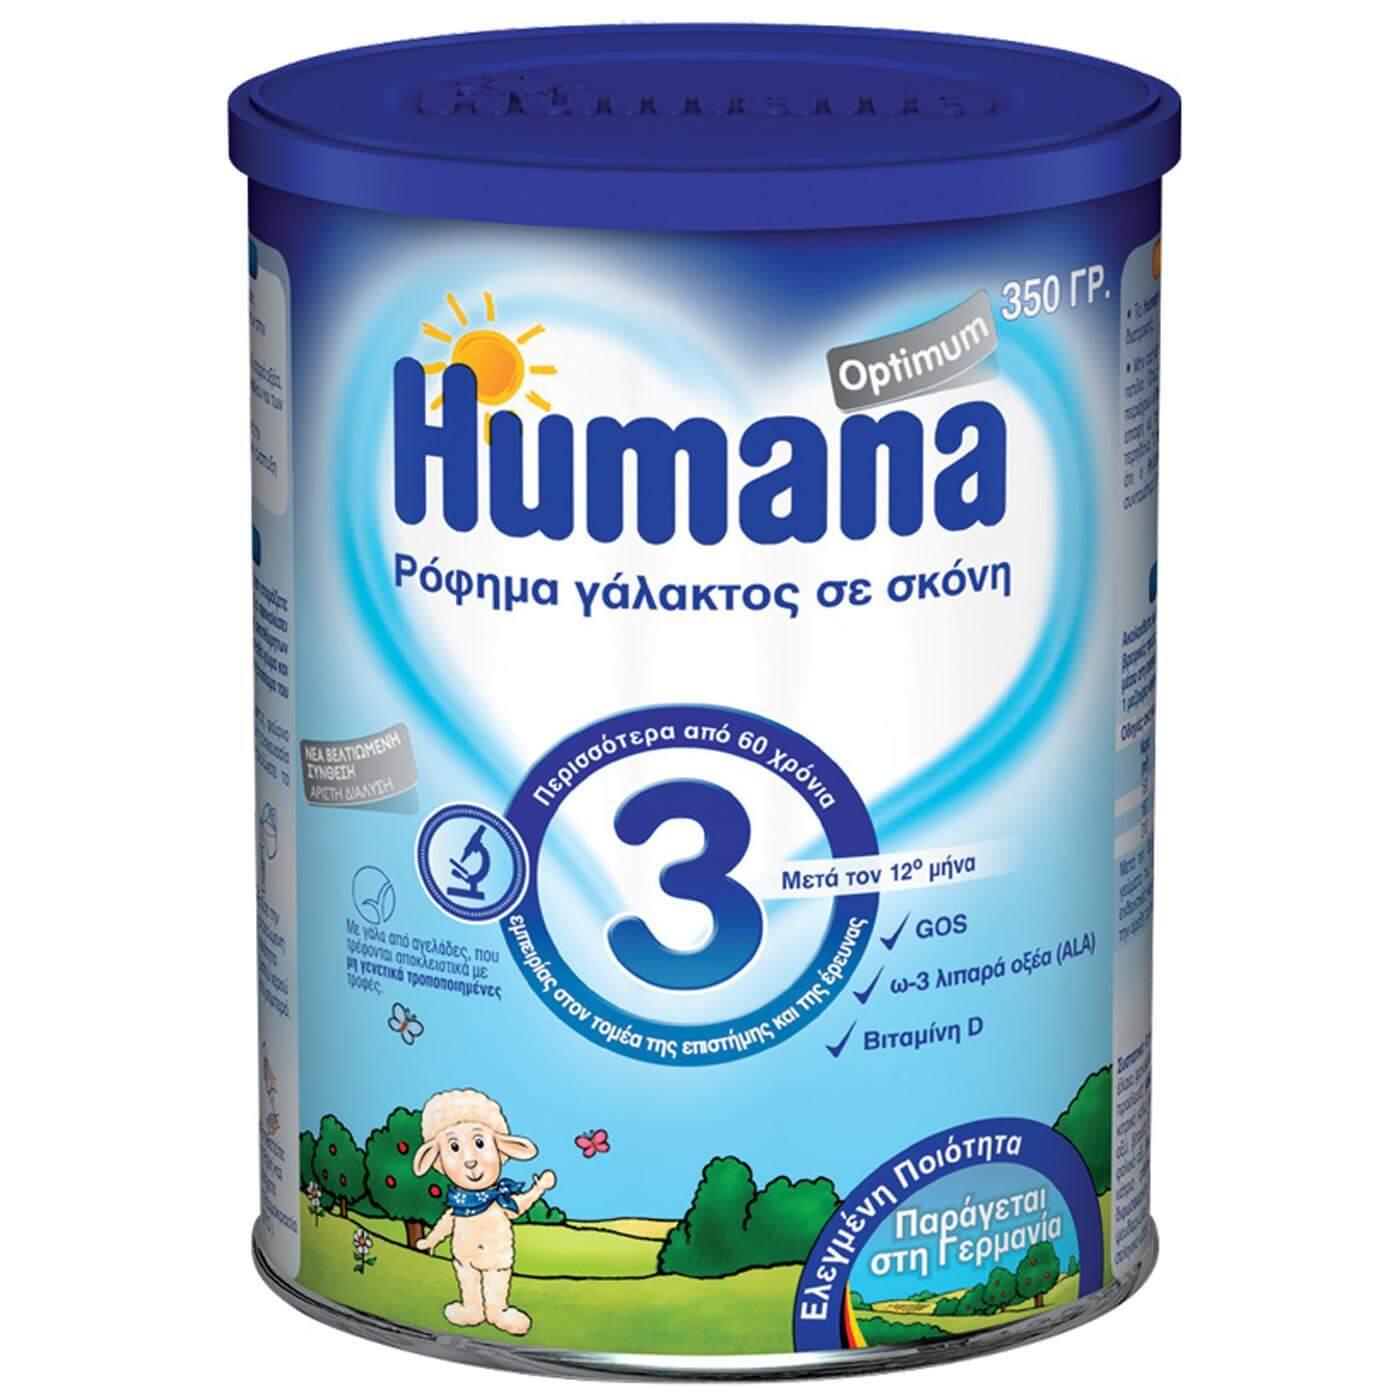 Humana Optimum 3, Ρόφημα Γάλακτος σε Σκόνη Μετά το 12ο Μήνα 350gr